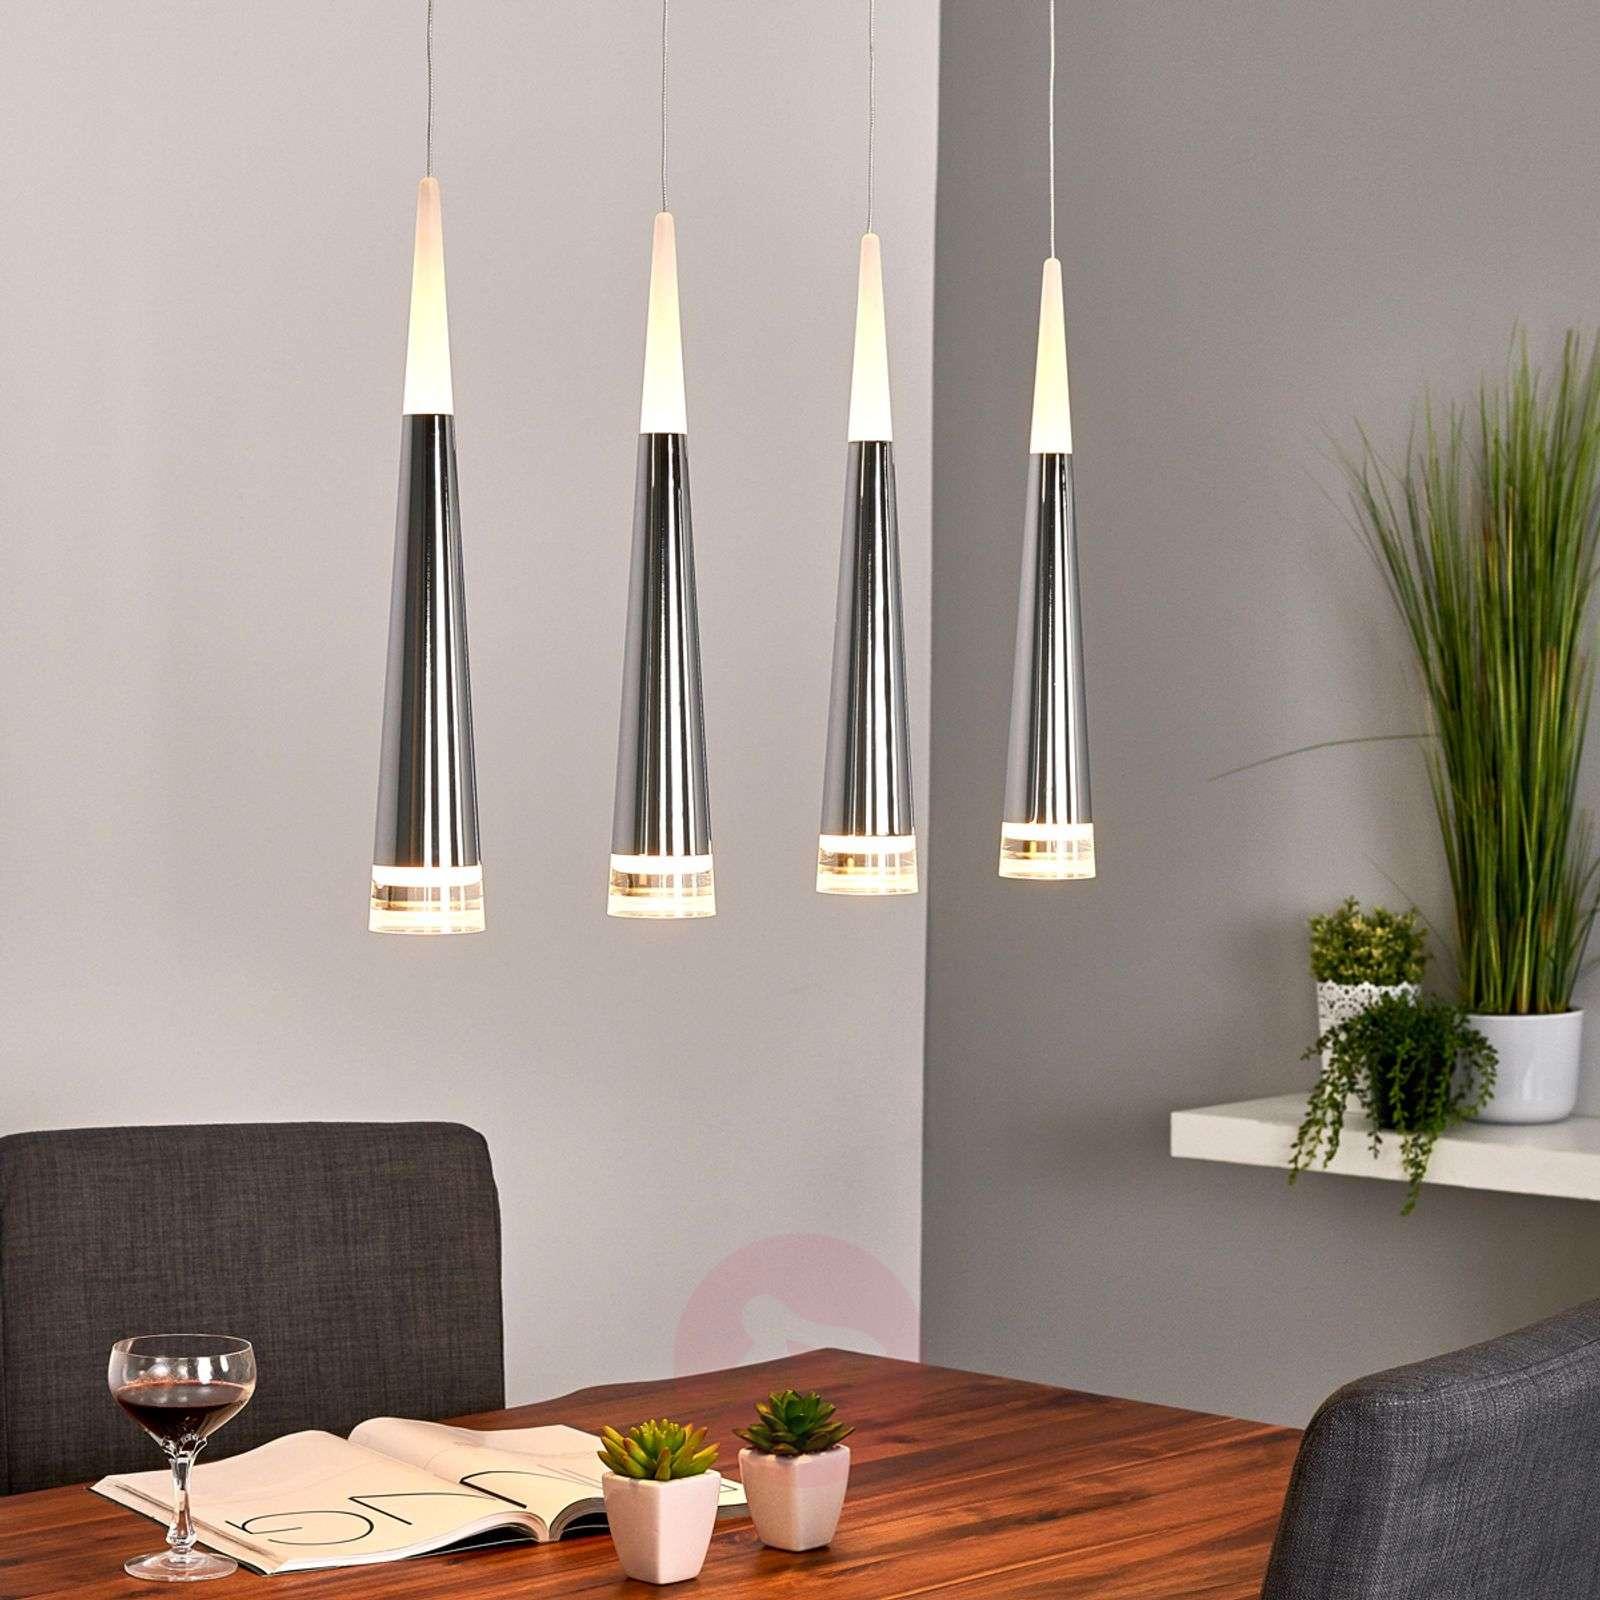 4-bulb LED hanging lamp Janne-9987052-06